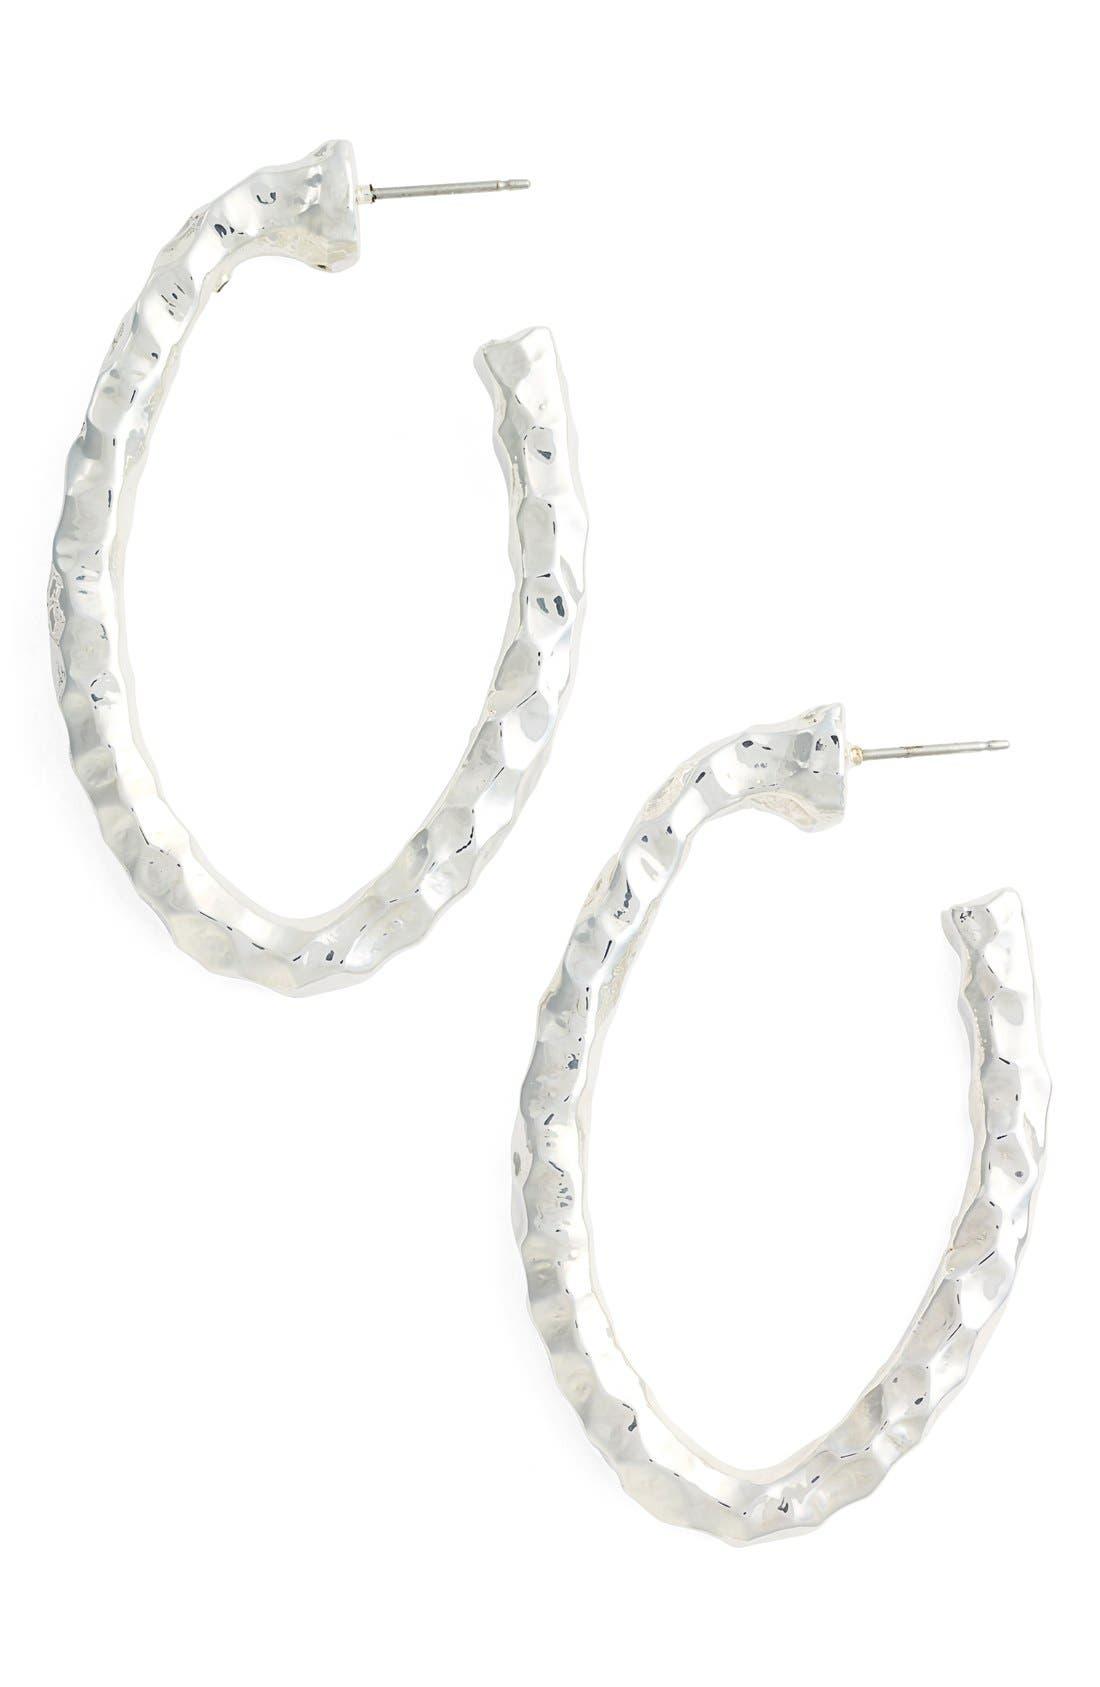 Simon Sebbag Hammered Hoop Earrings